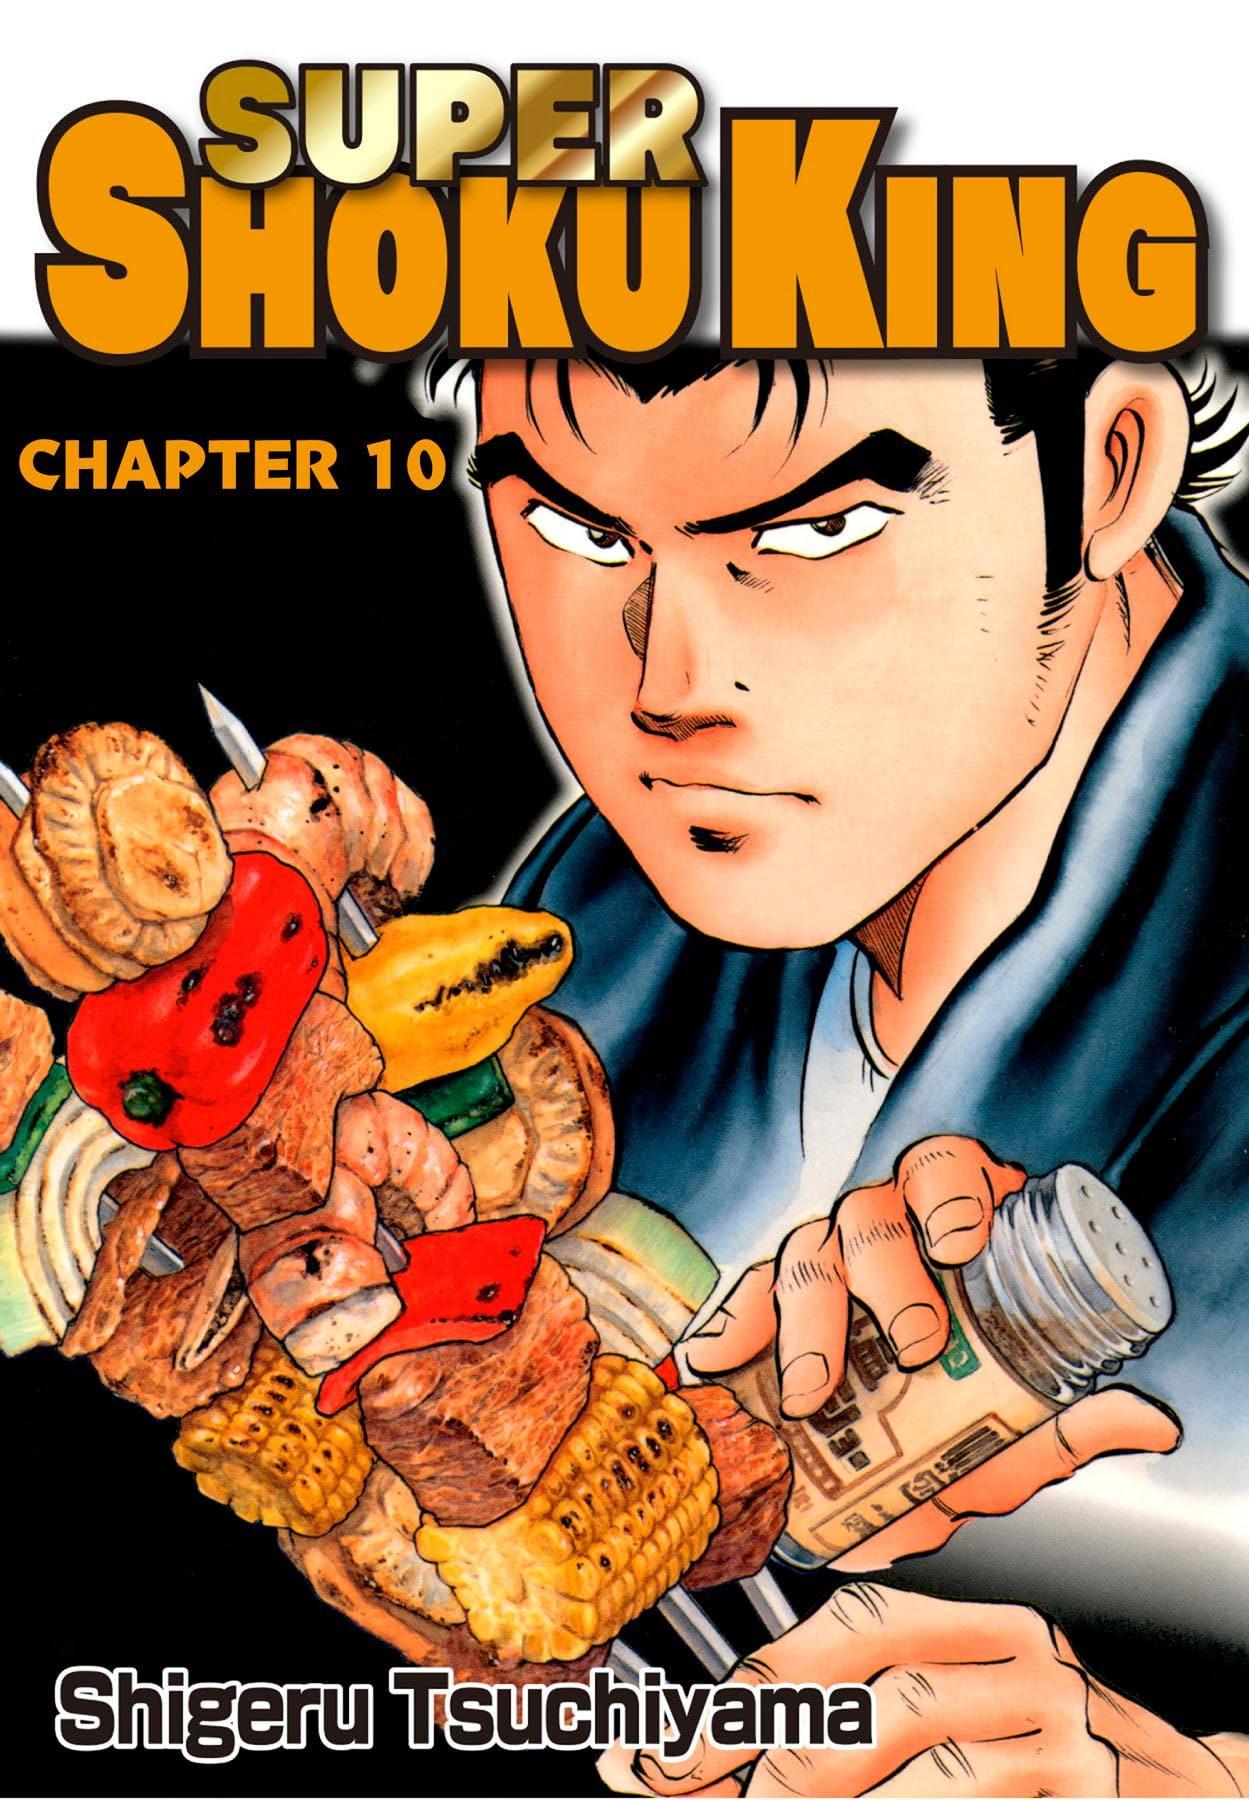 SUPER SHOKU KING #10